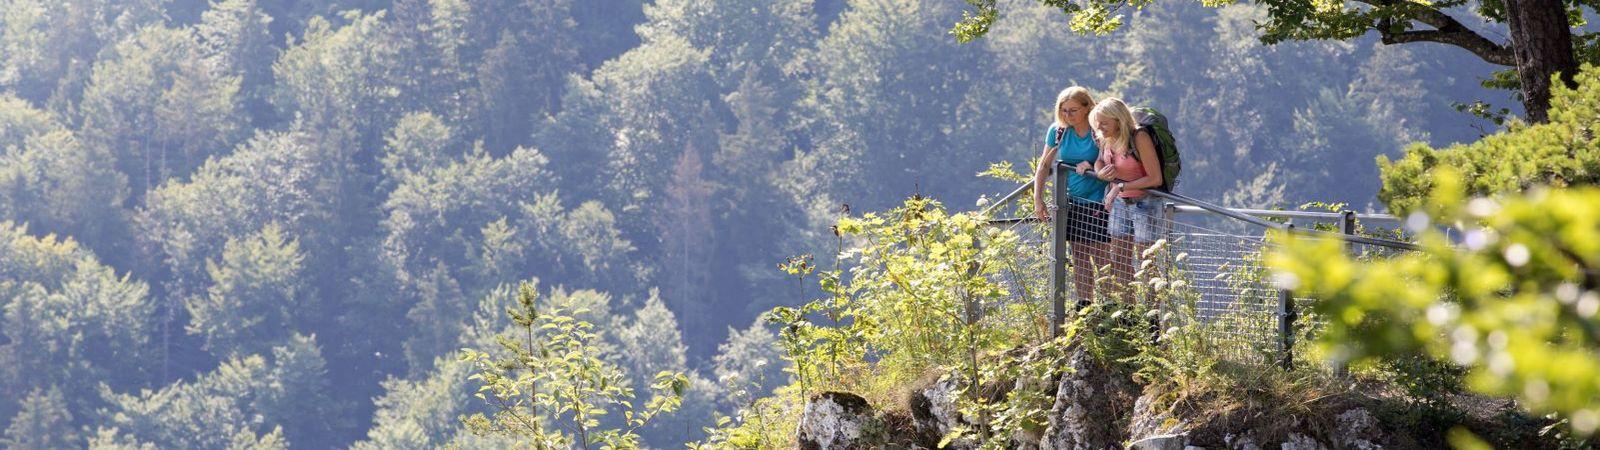 Knopfmacherfelsen Fridingen Donautal